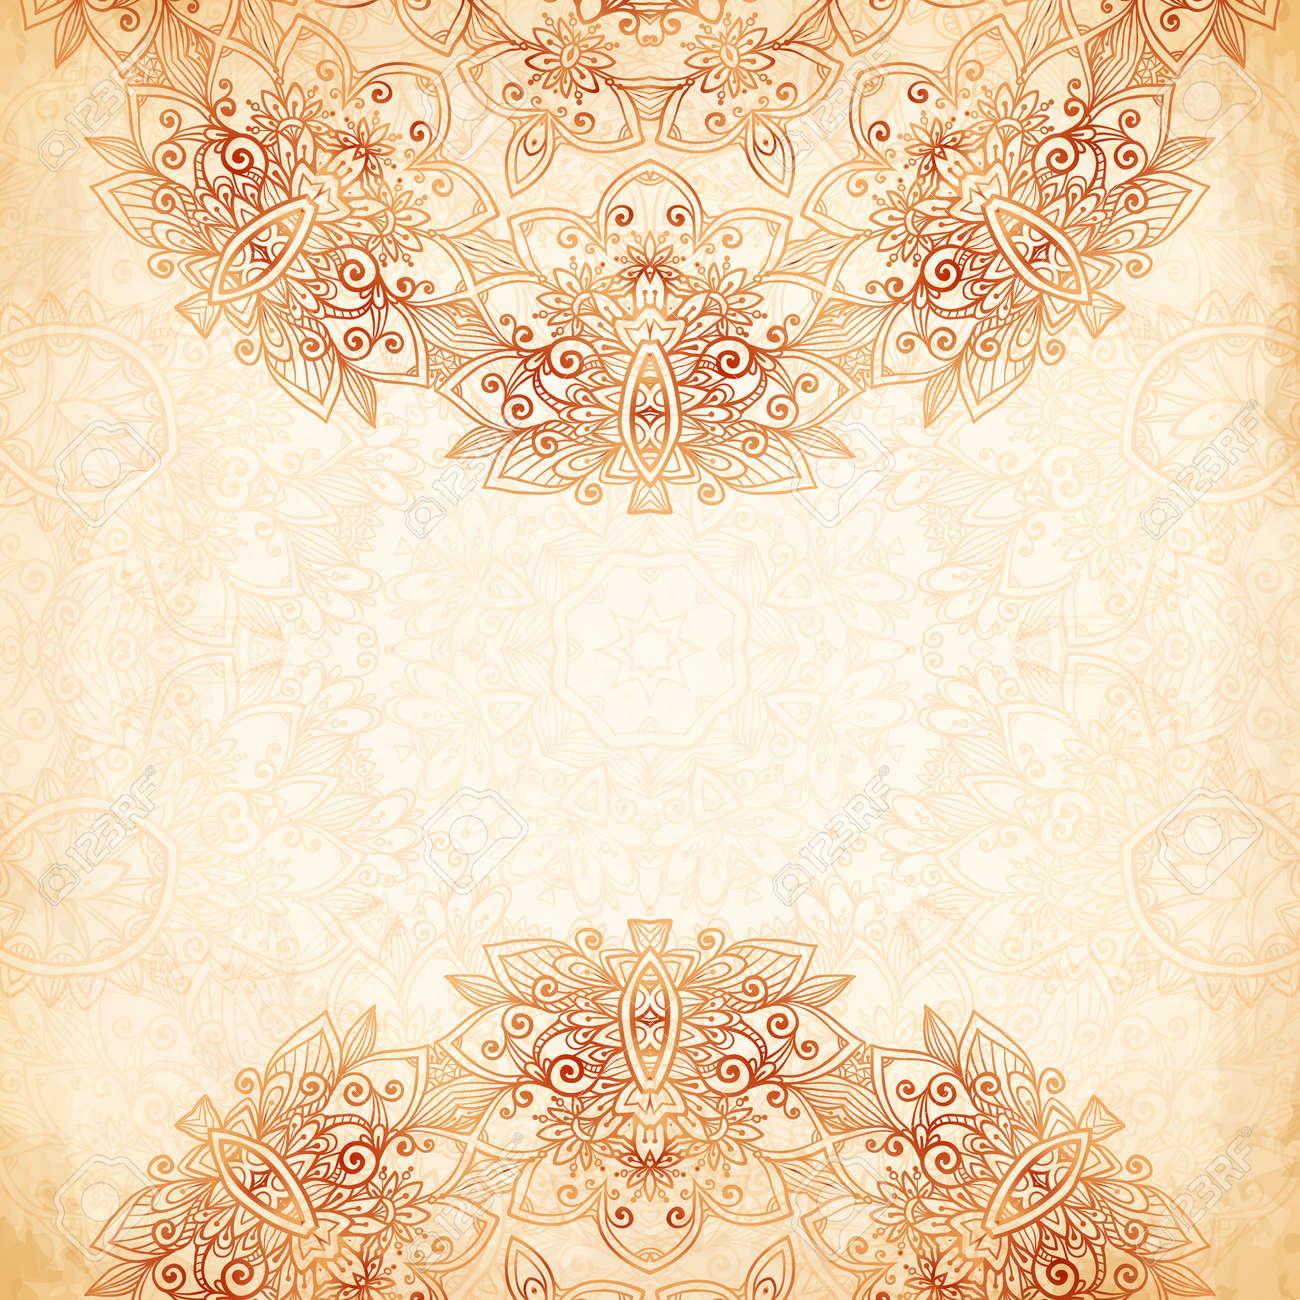 Ornate vintage vector background in mehndi style royalty free stock - Ornate Vintage Background In Mehndi Style Stock Vector 29752122